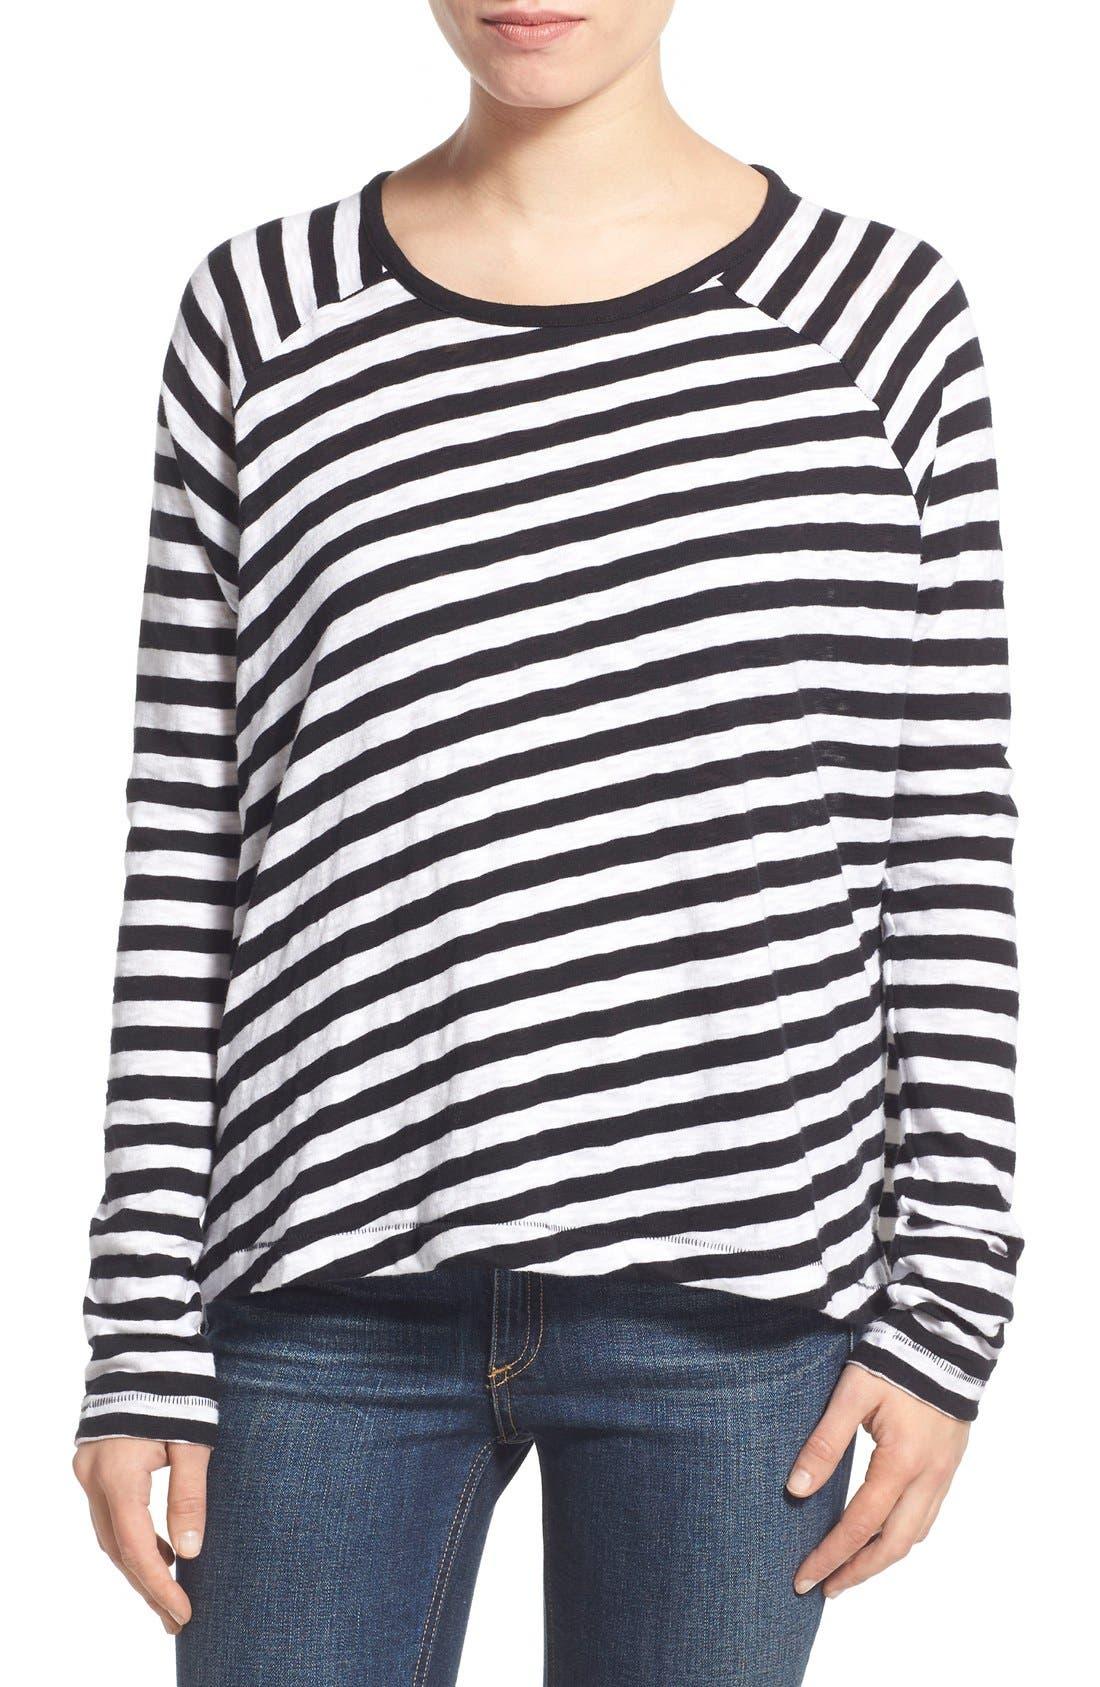 Main Image - rag & bone/JEAN 'Camden' Stripe Long Sleeve Tee